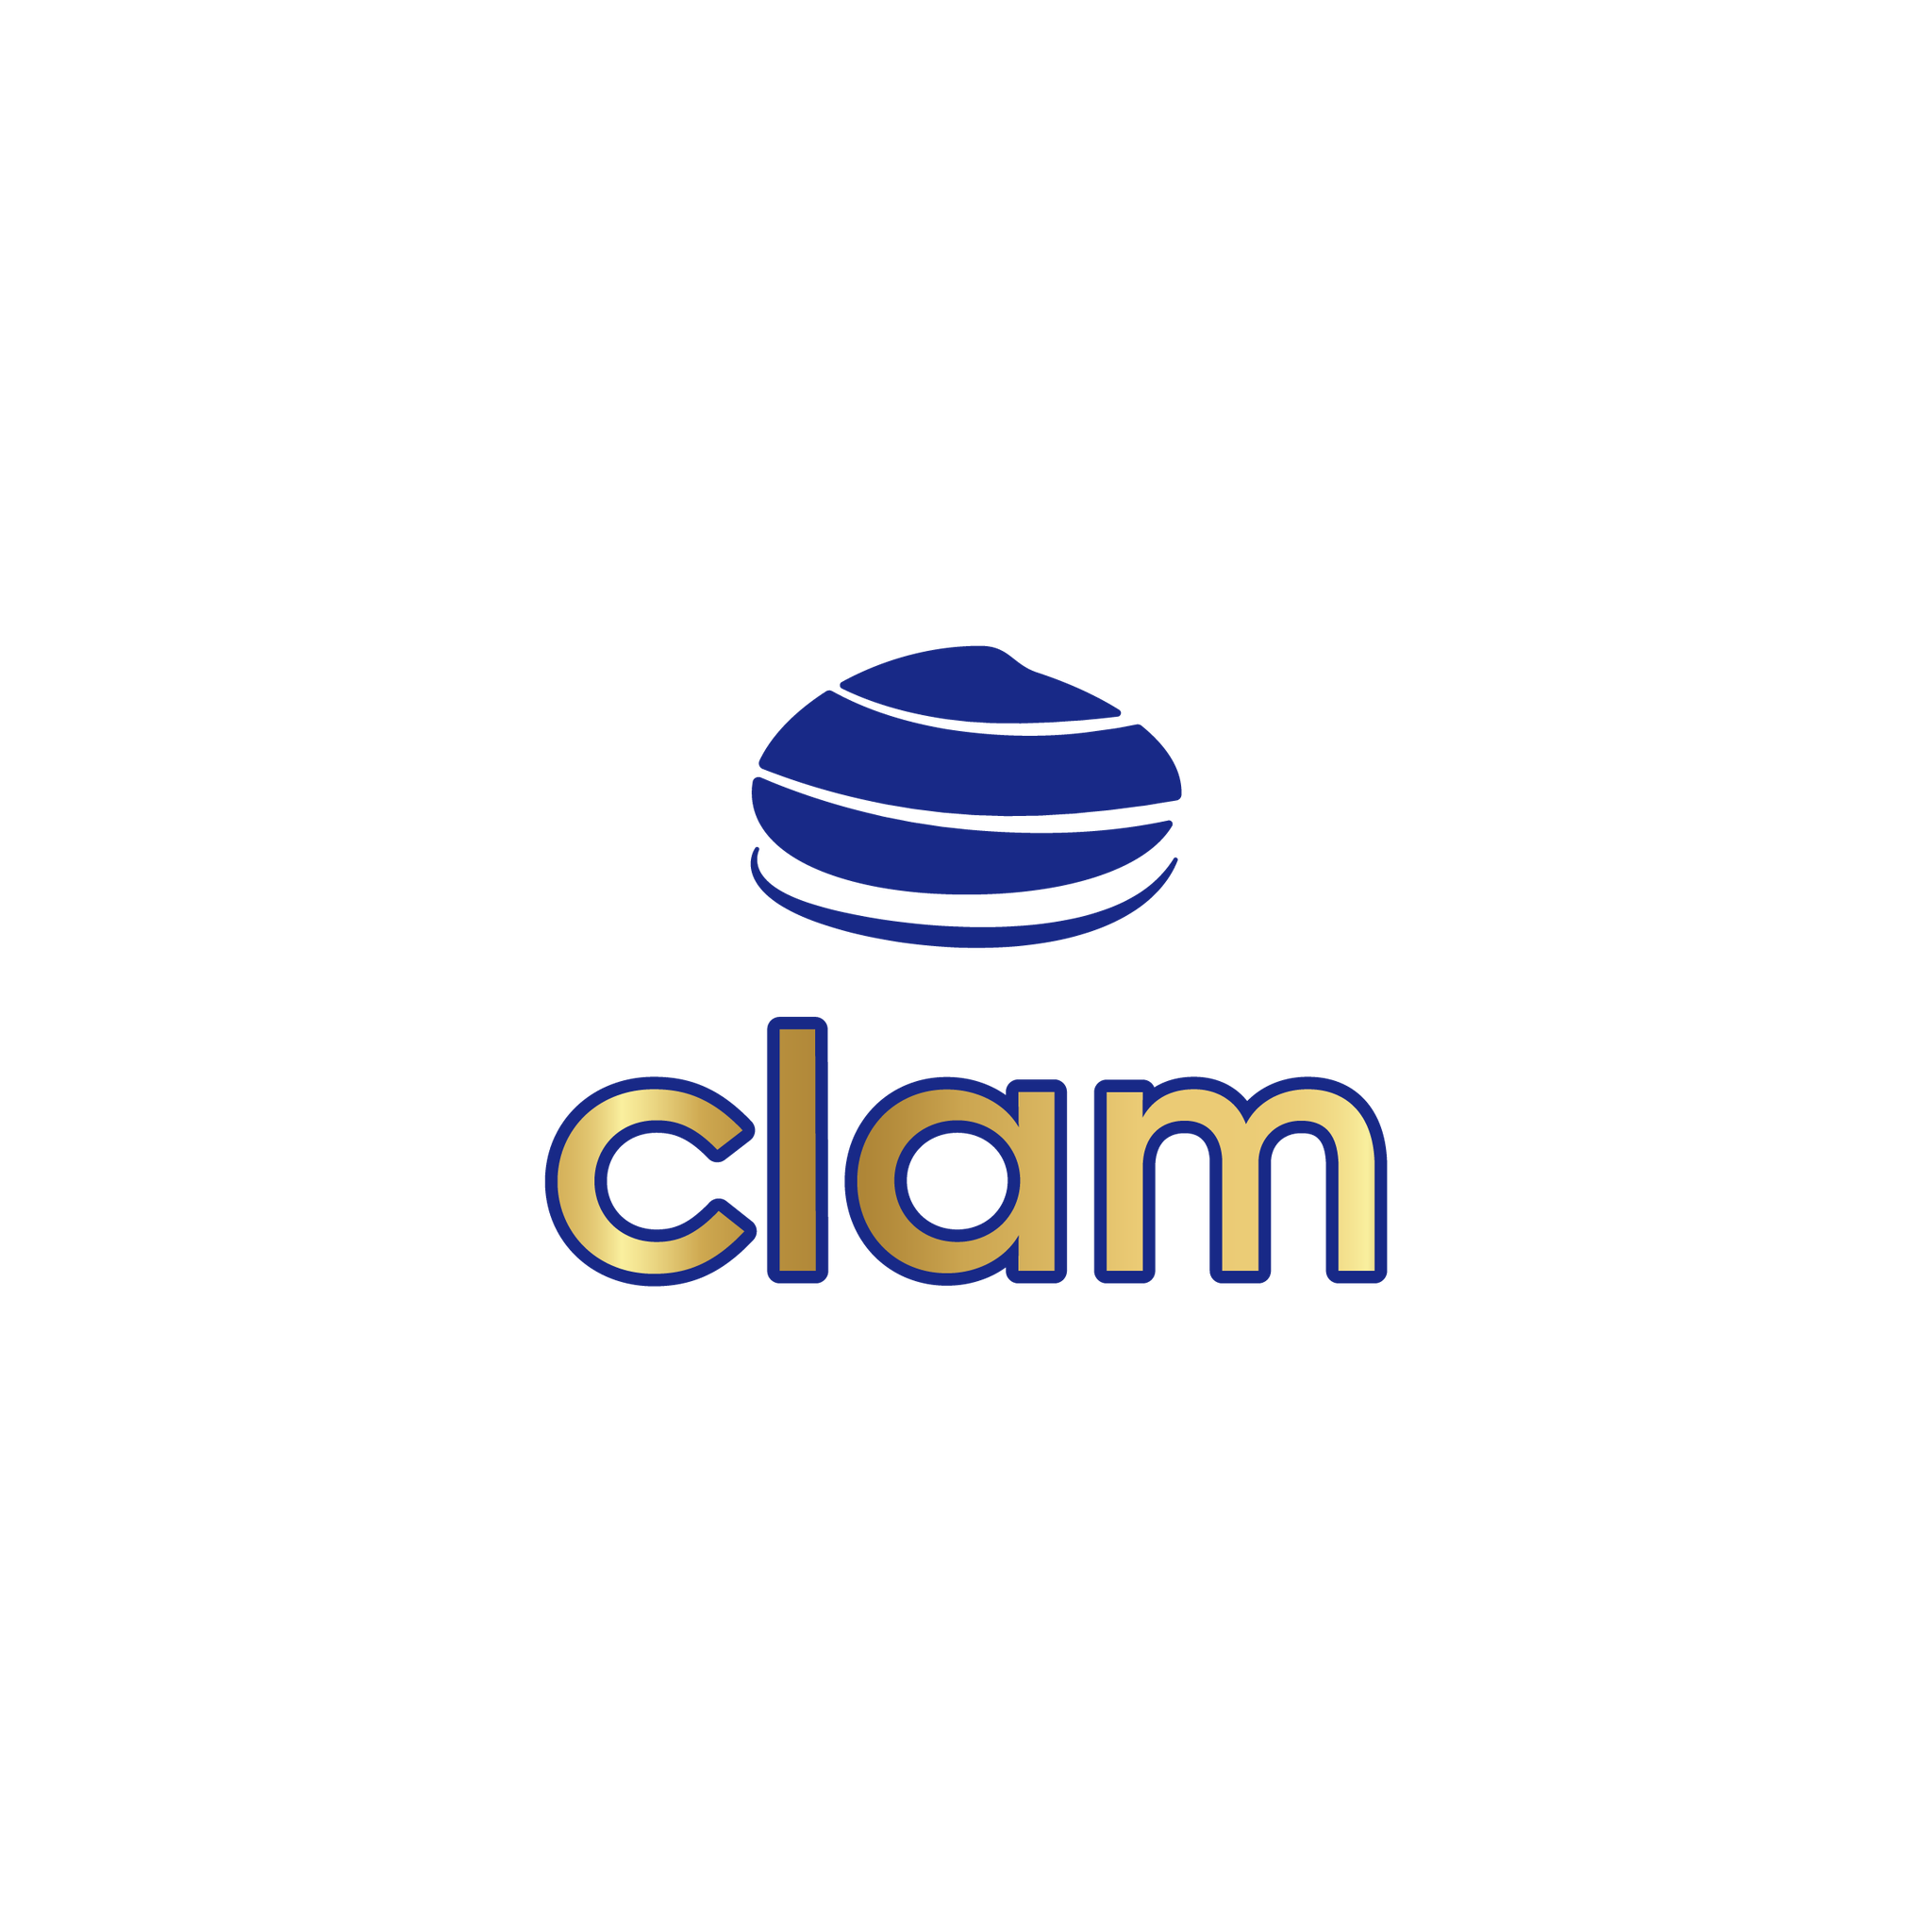 clam(クラム) 夙川・苦楽園